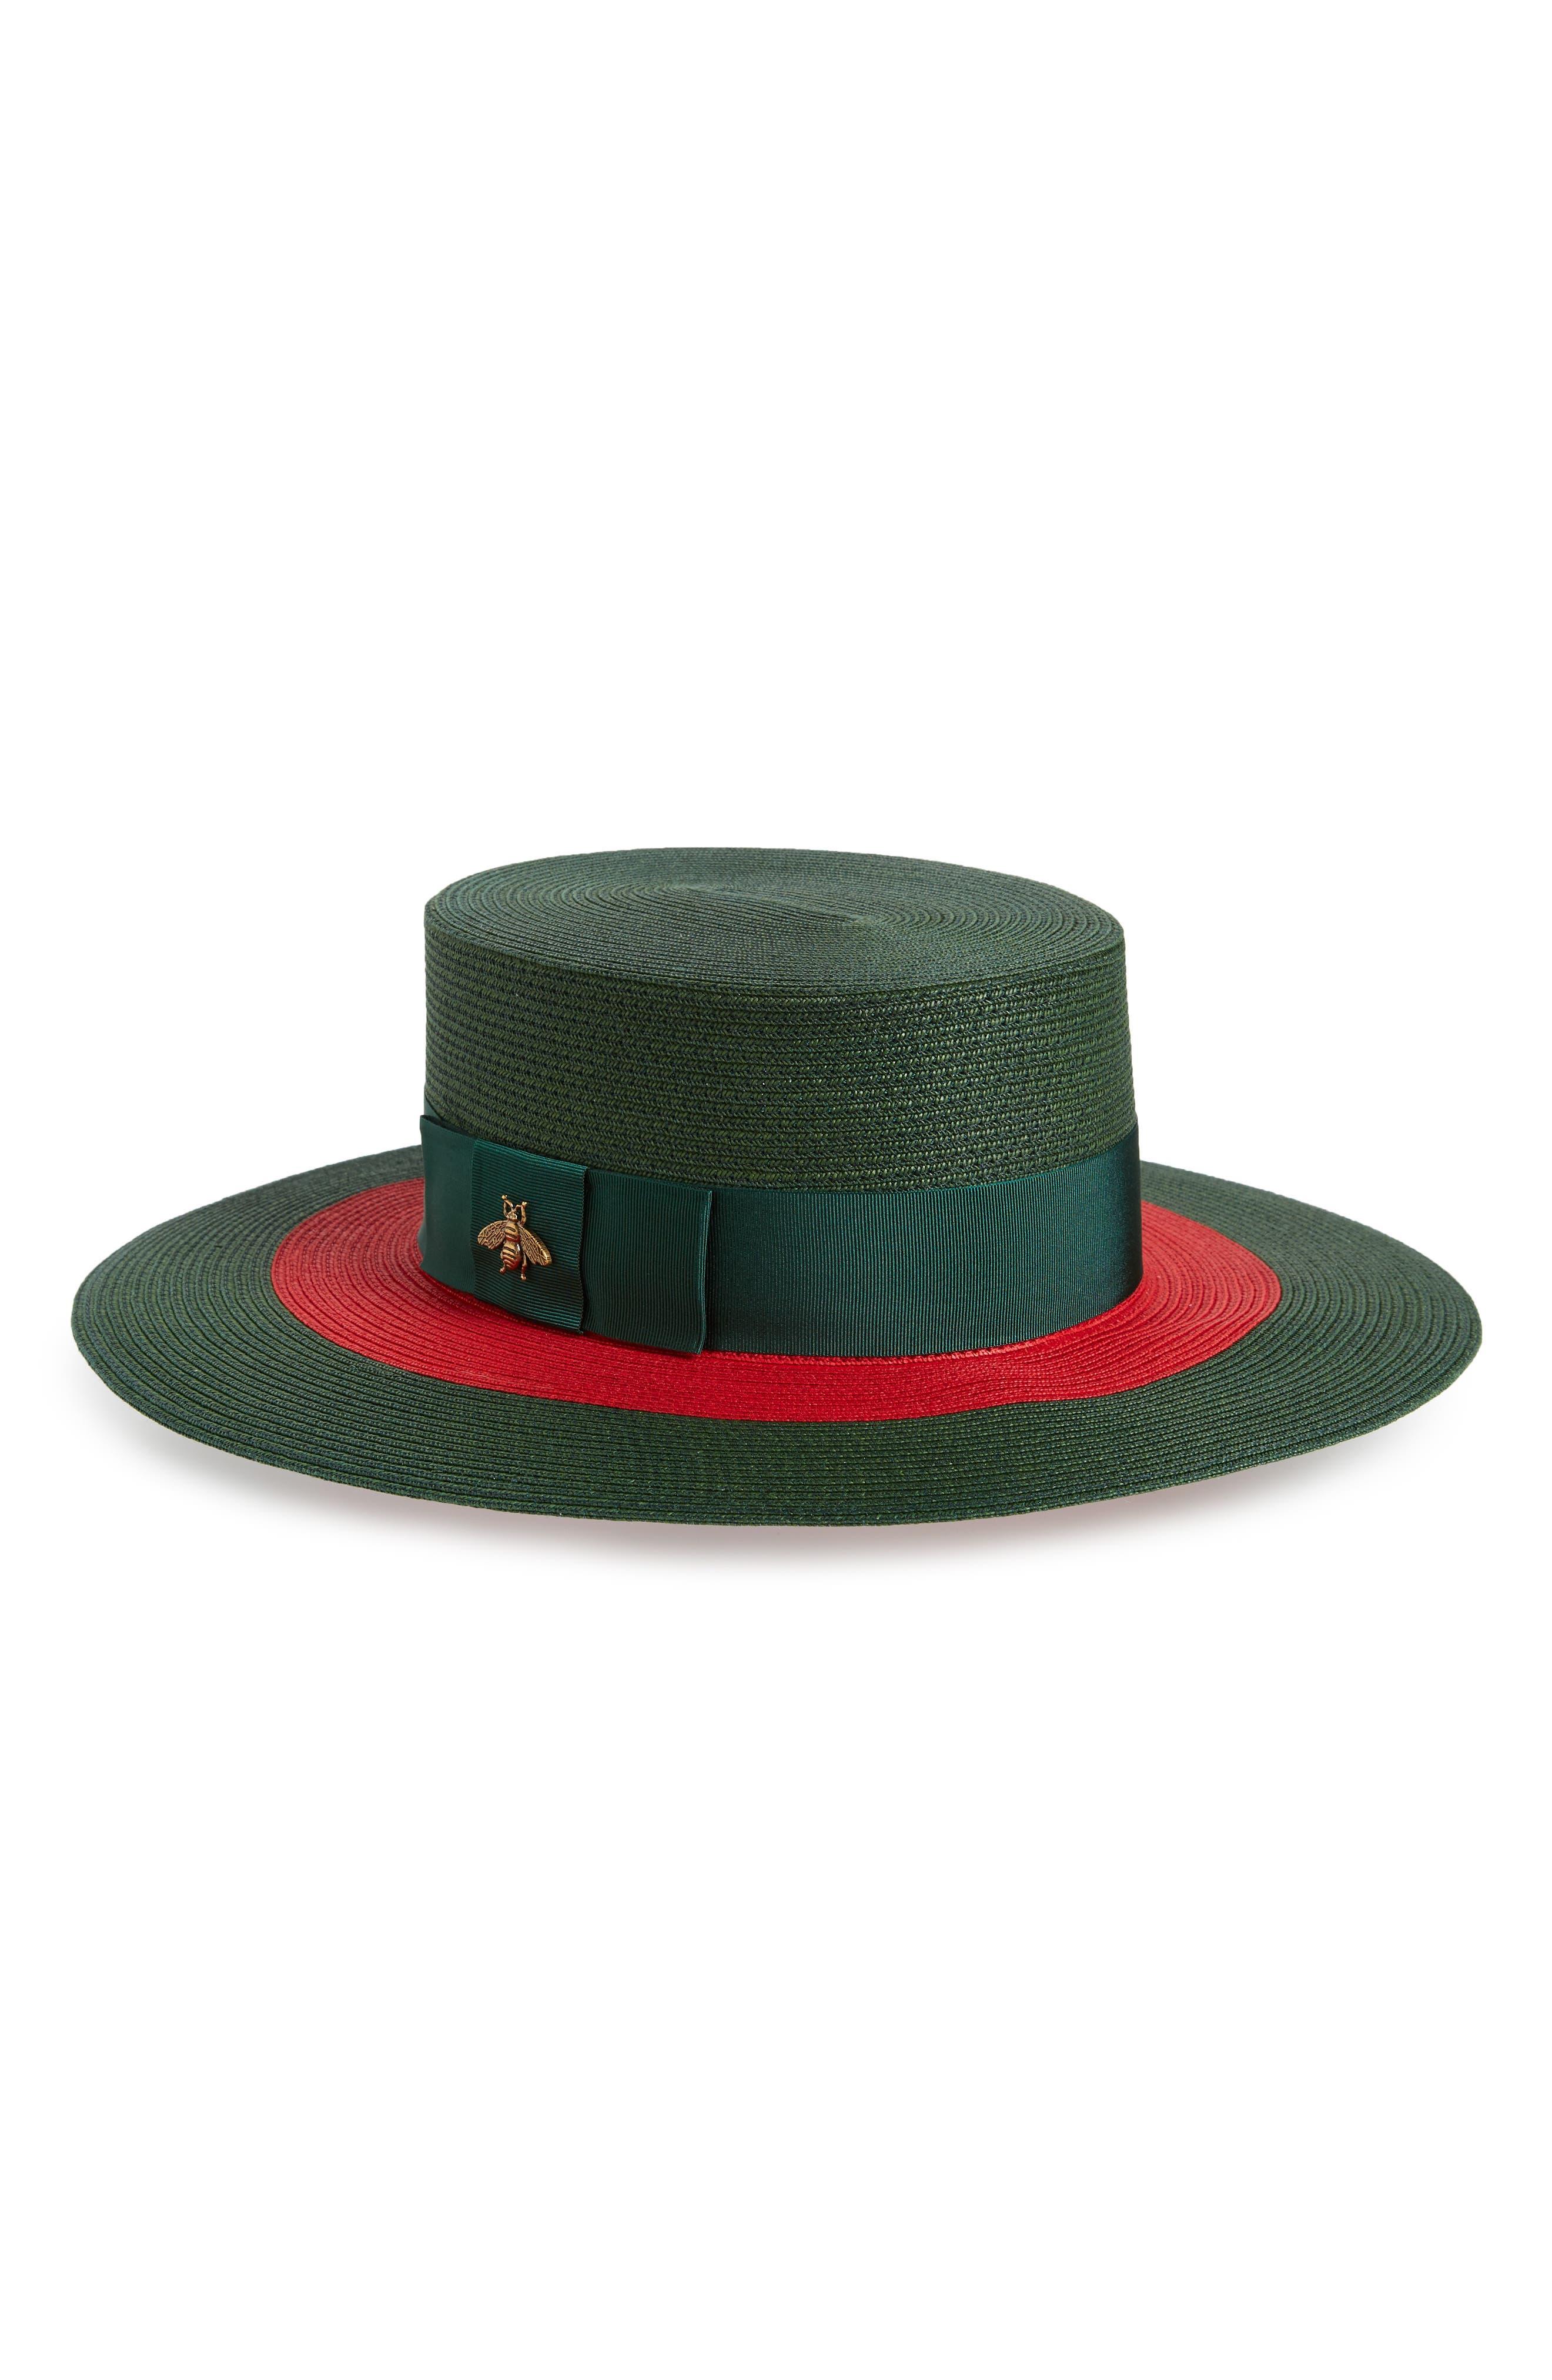 GUCCI, Alba Woven Straw Hat, Main thumbnail 1, color, 301